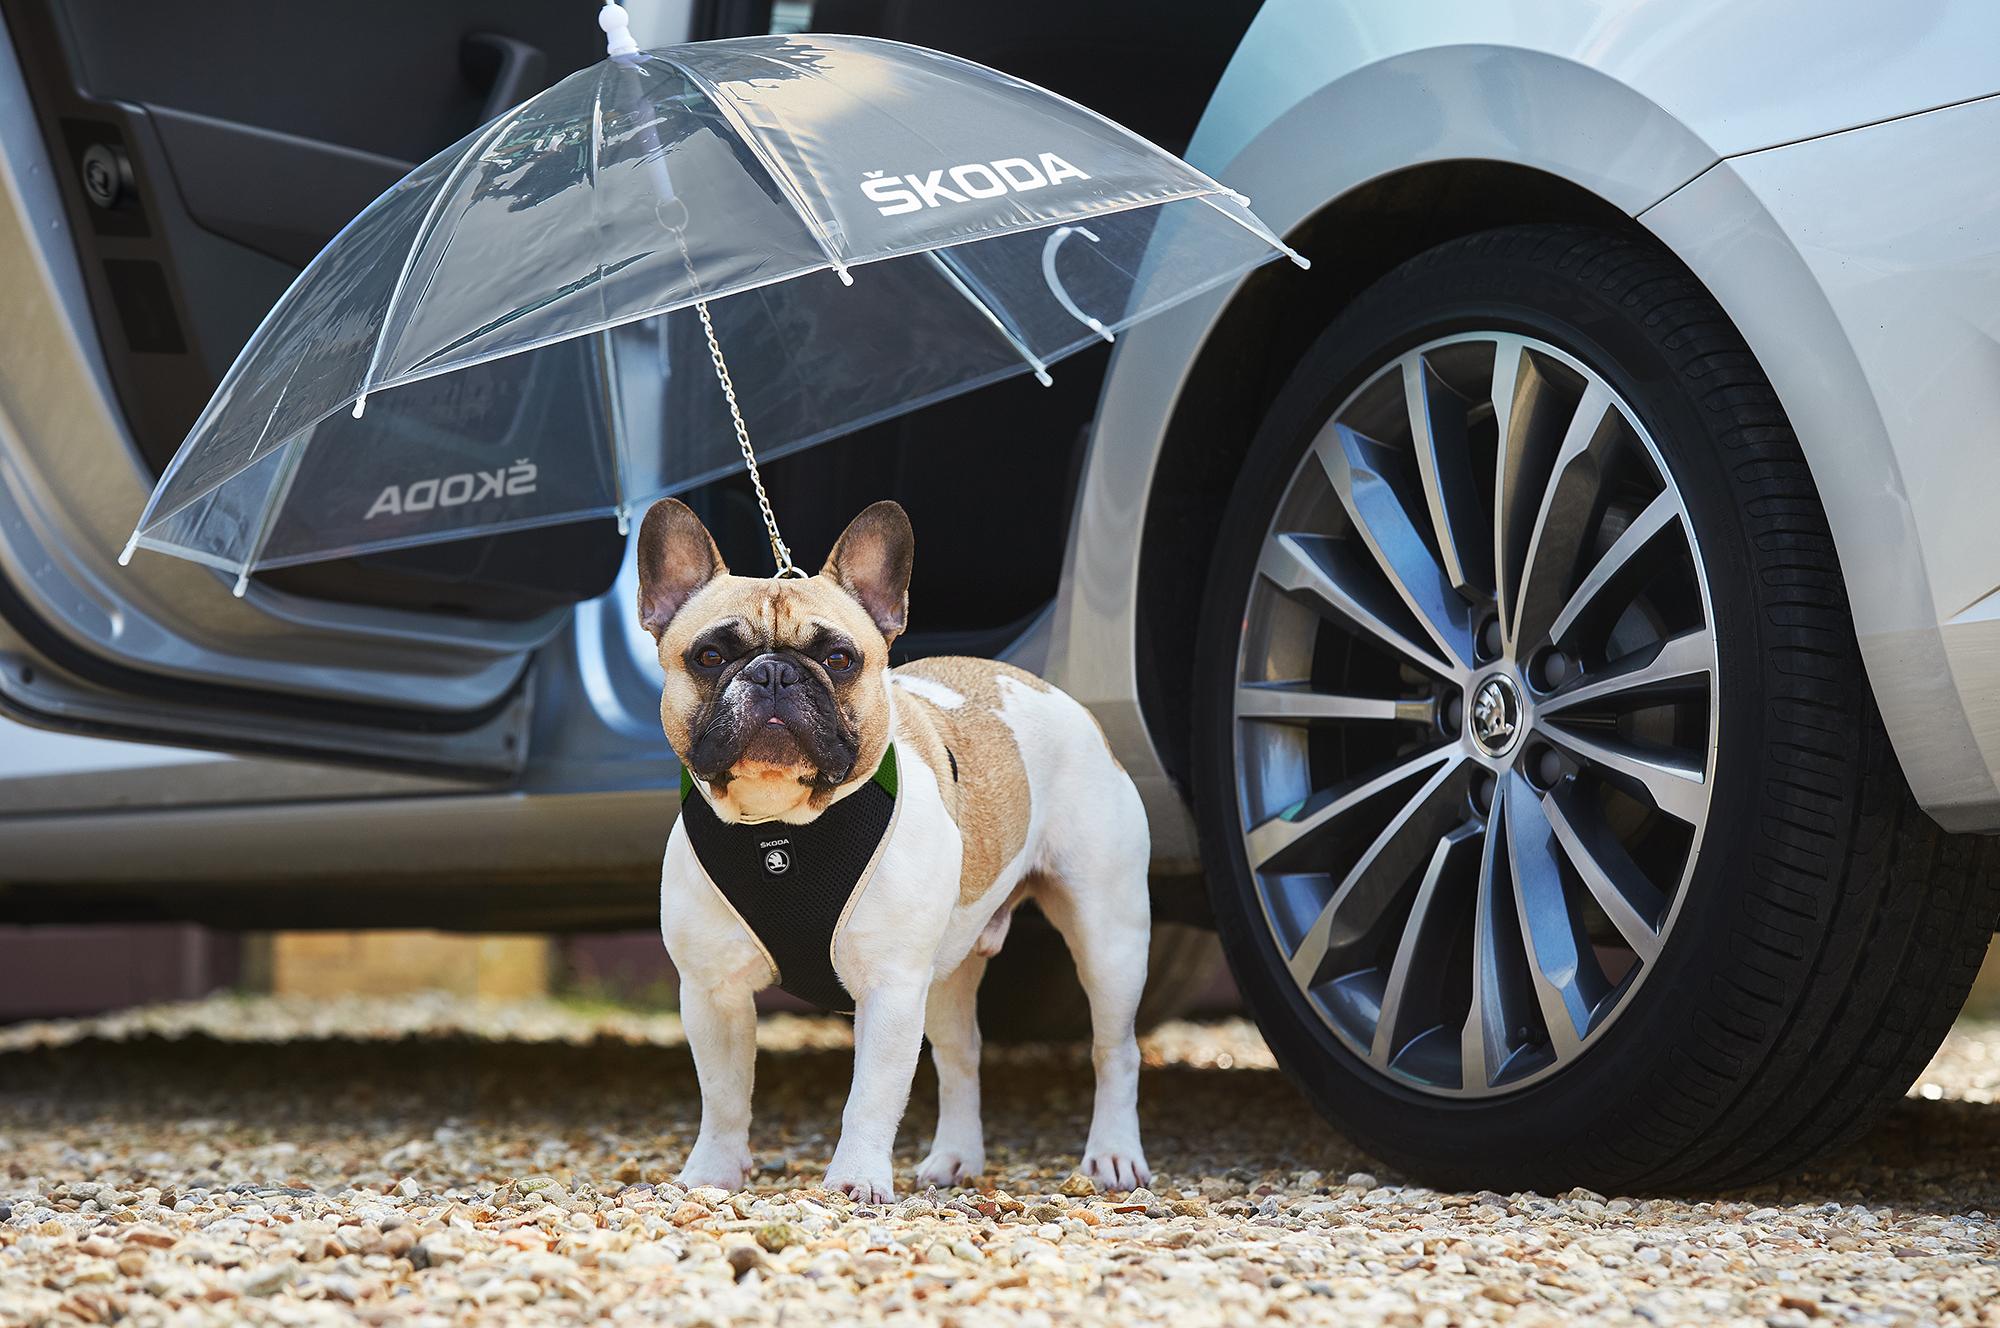 Pet Car Hammock >> Skoda reveals DOG Umbrella option for the Superb | Cars UK